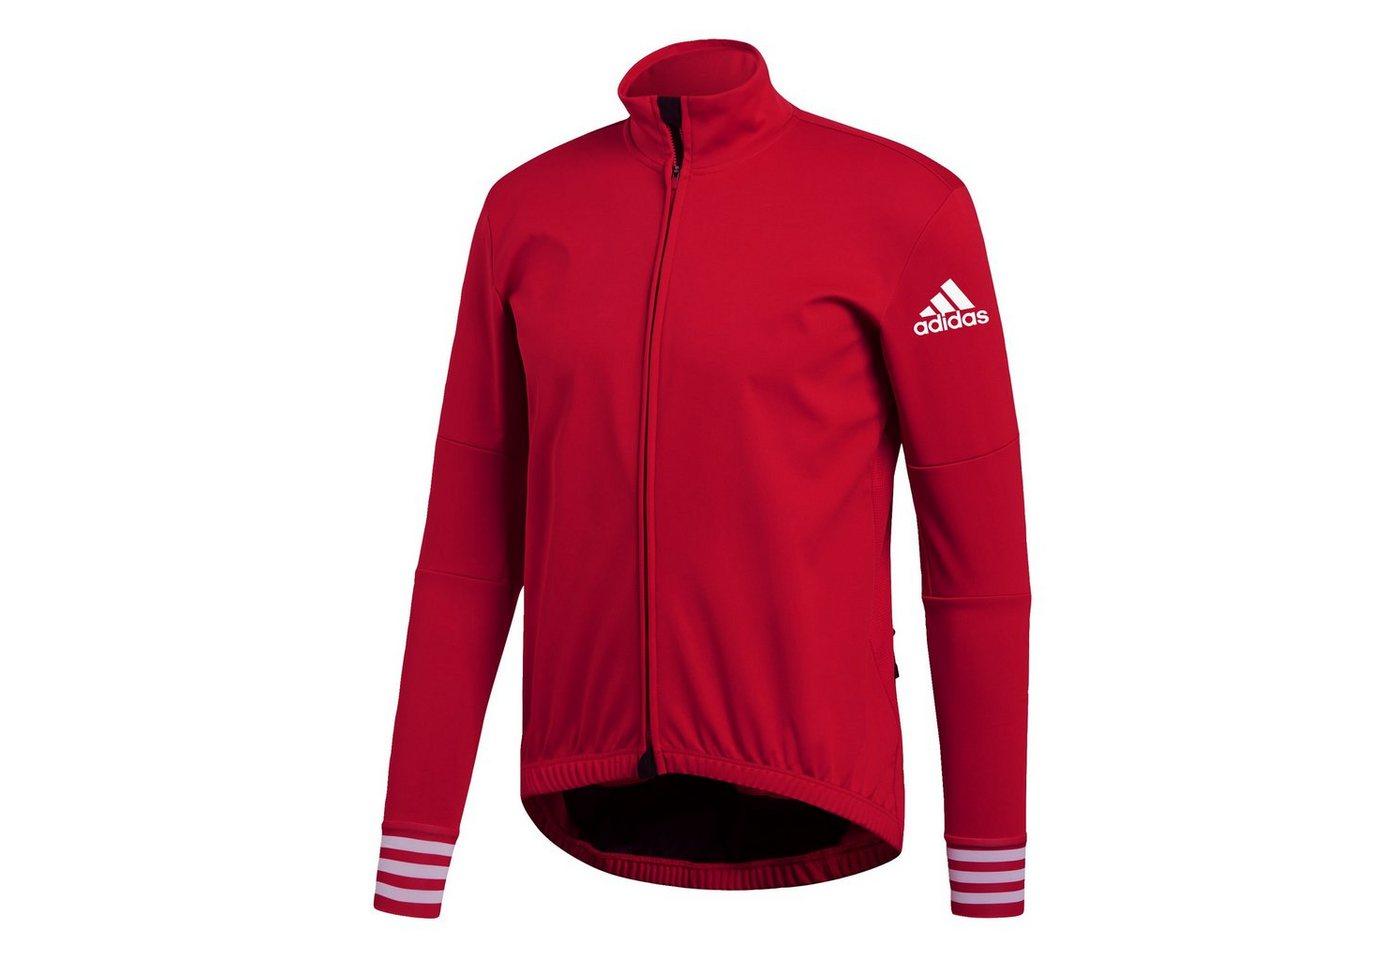 adidas Performance Sporttop »Adistar Winter Trikot« | Sportbekleidung > Trikots > Sonstige Trikots | Rot | Trikot | adidas Performance